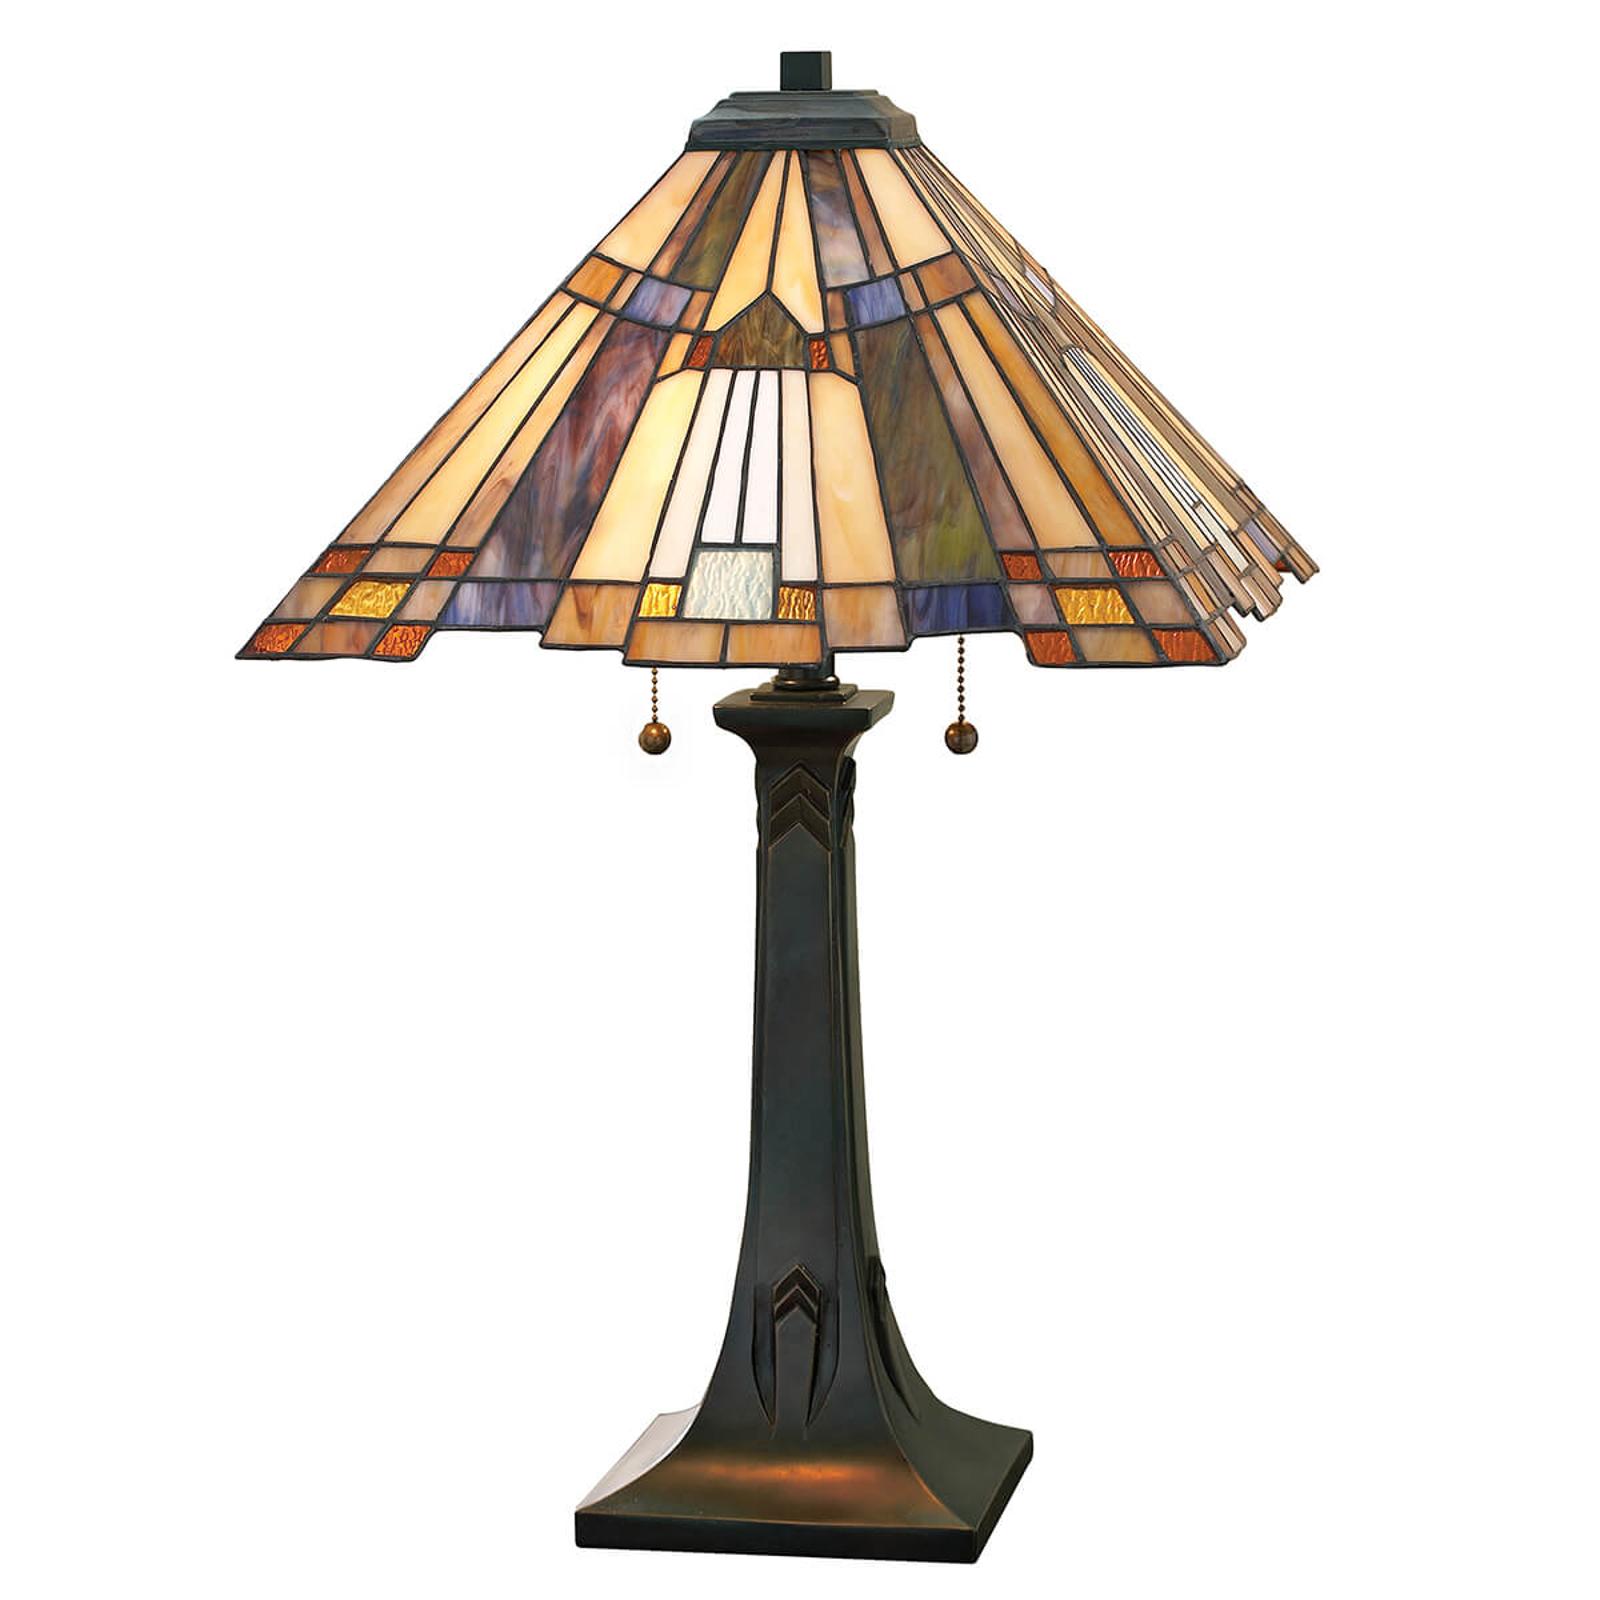 Tafellamp Inglenook met bont glas